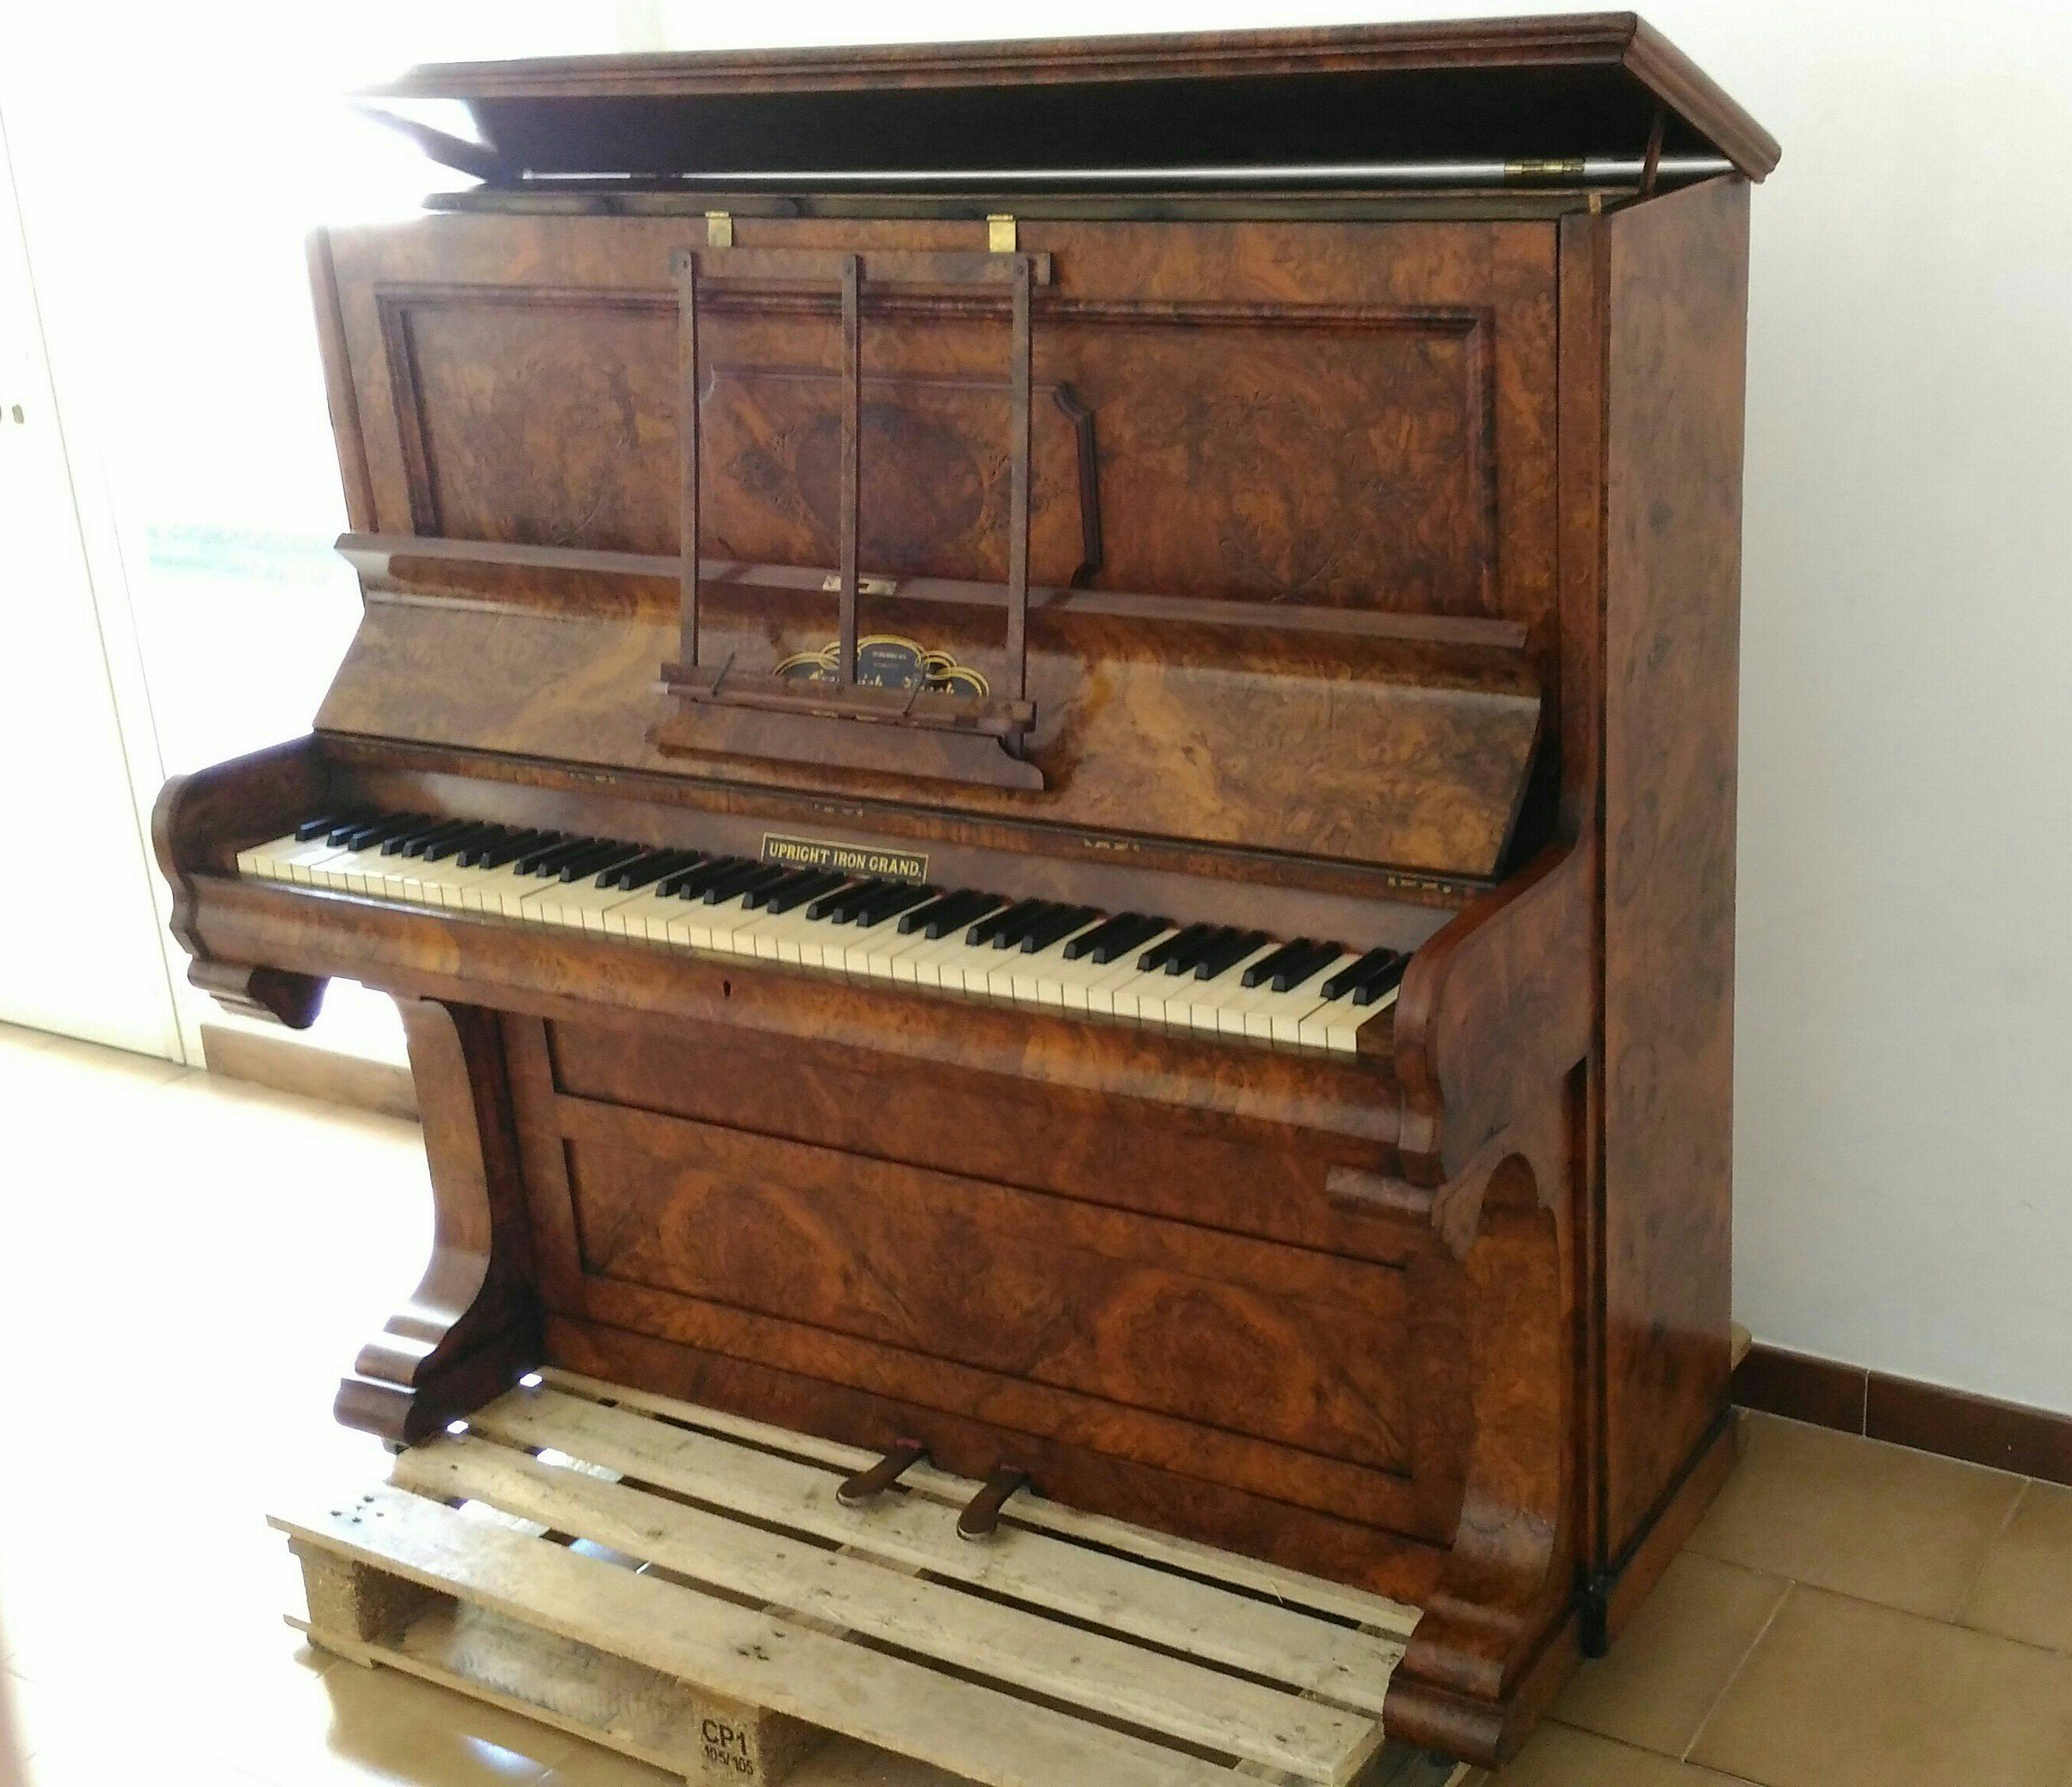 Piano droit Frederick Reach, 1870, Londres